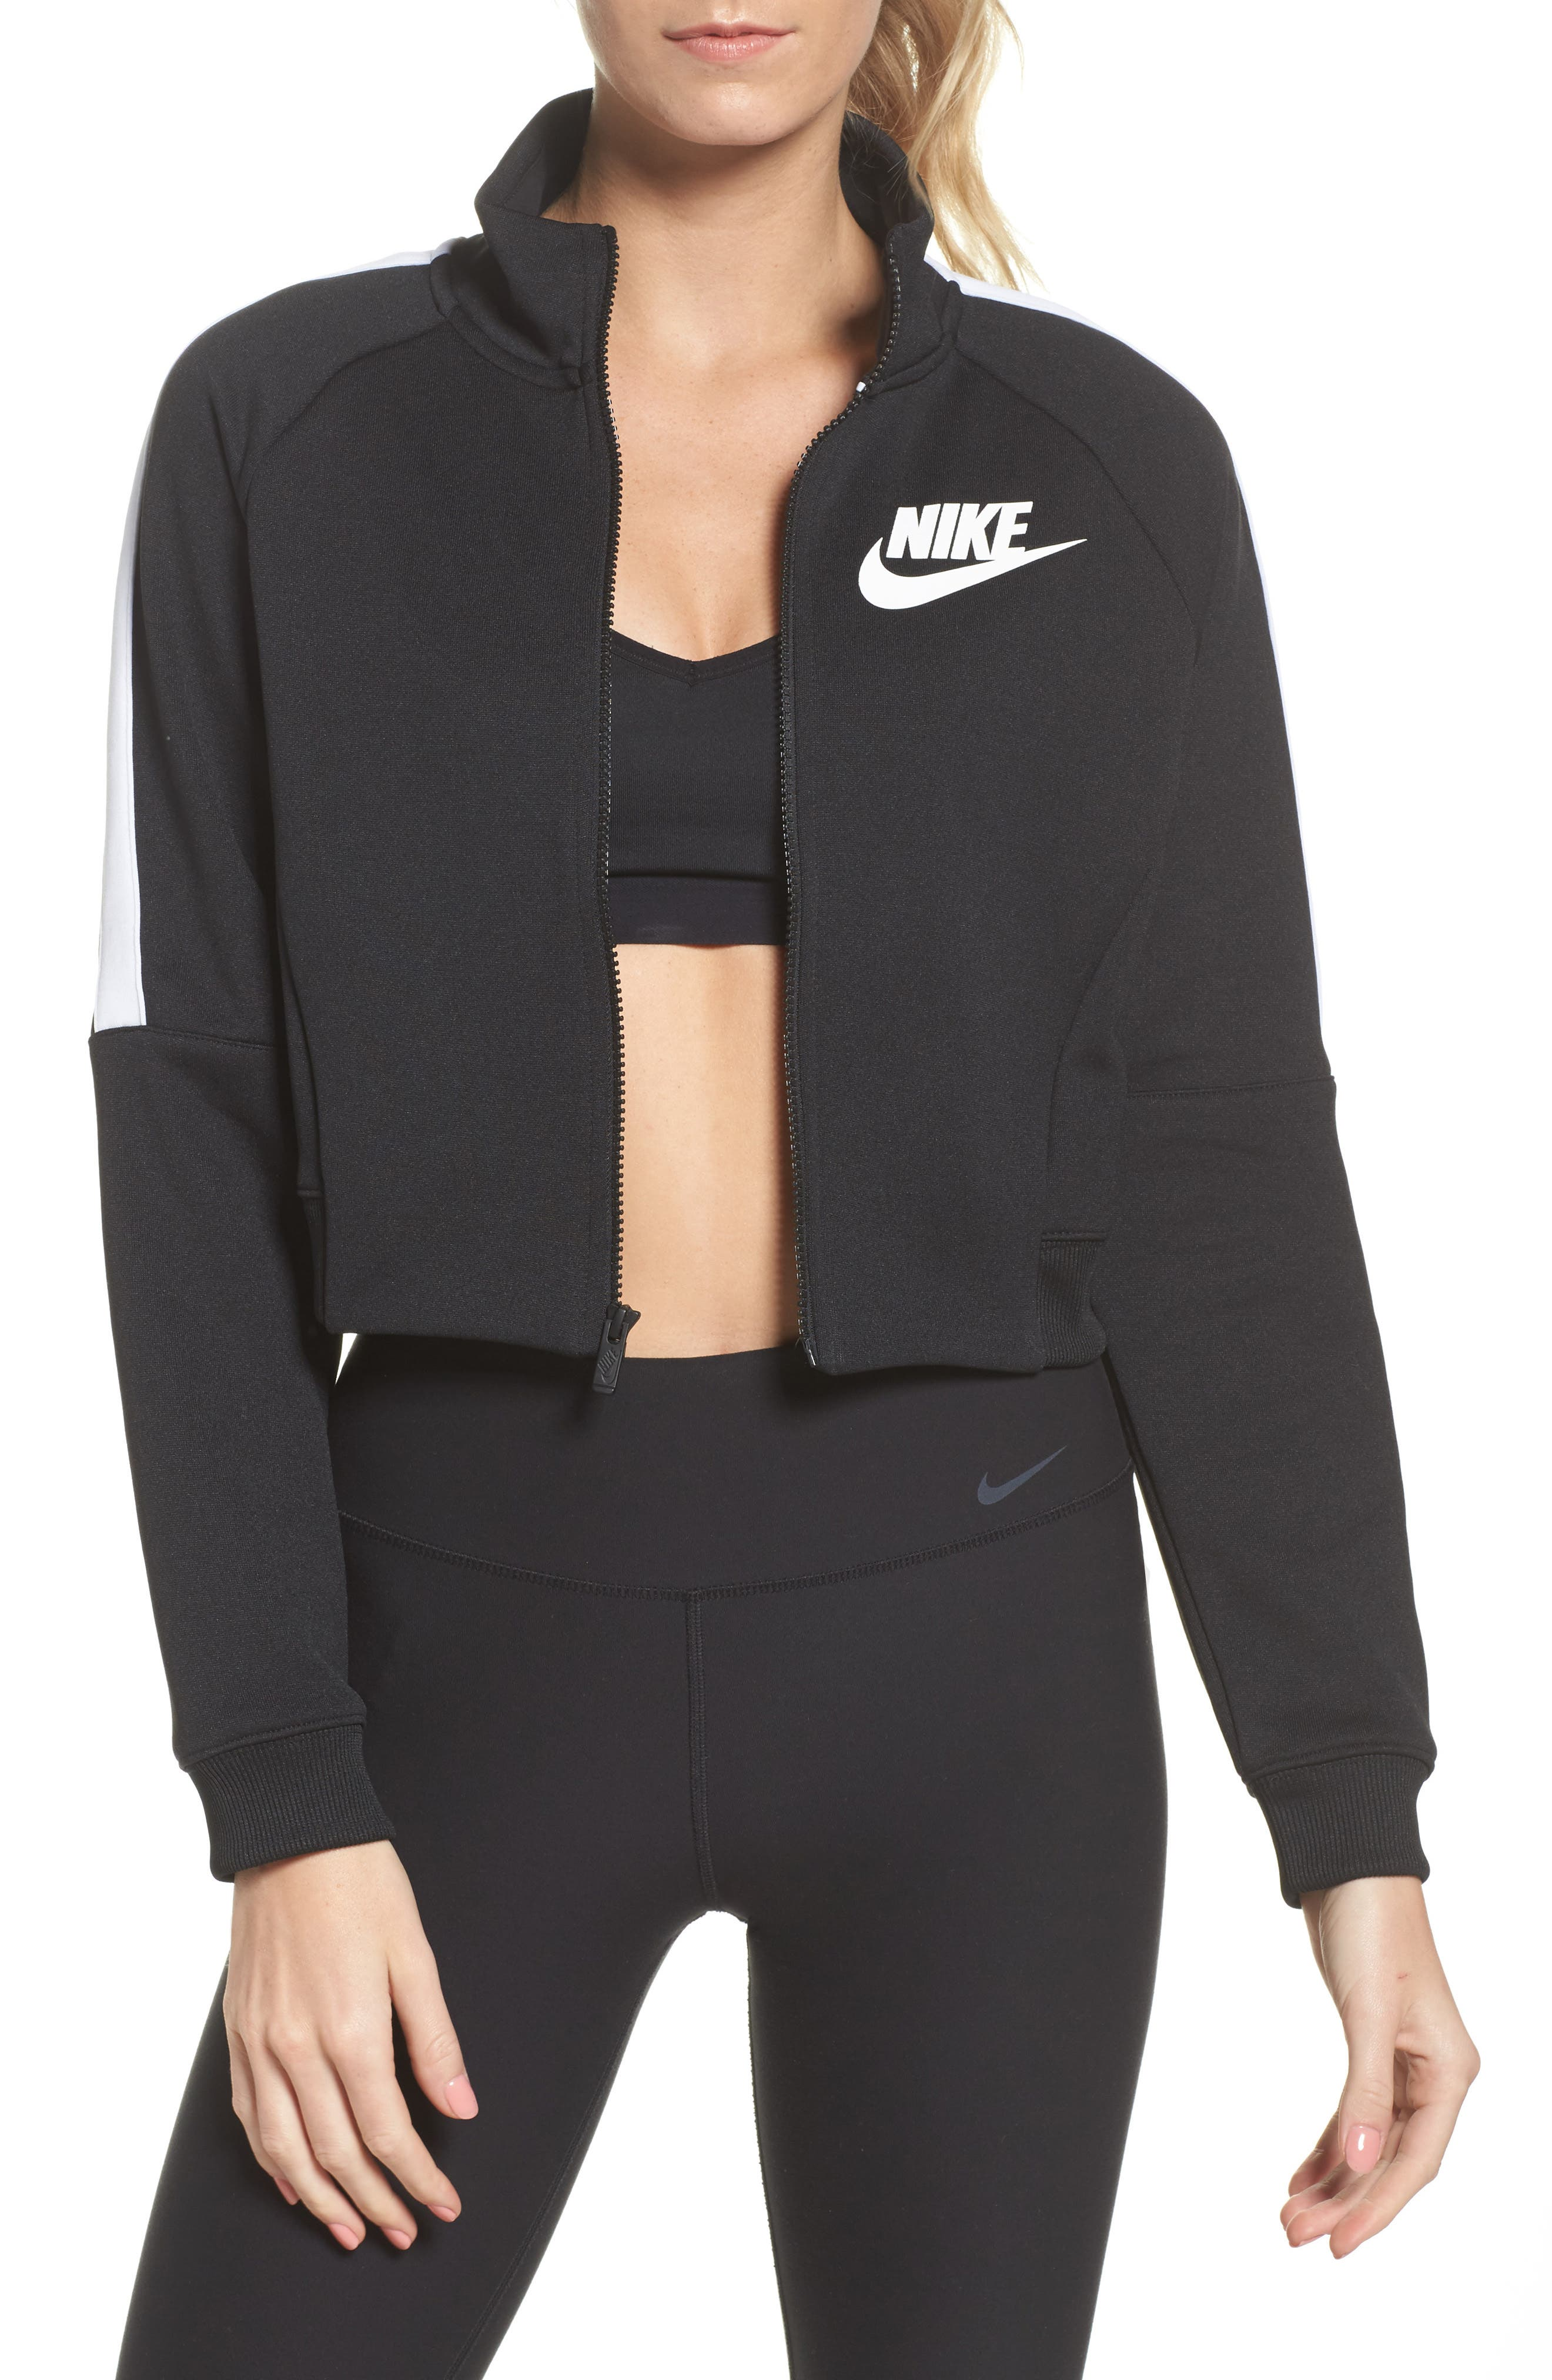 Sportswear N98 Jacket,                             Main thumbnail 1, color,                             Black/ White